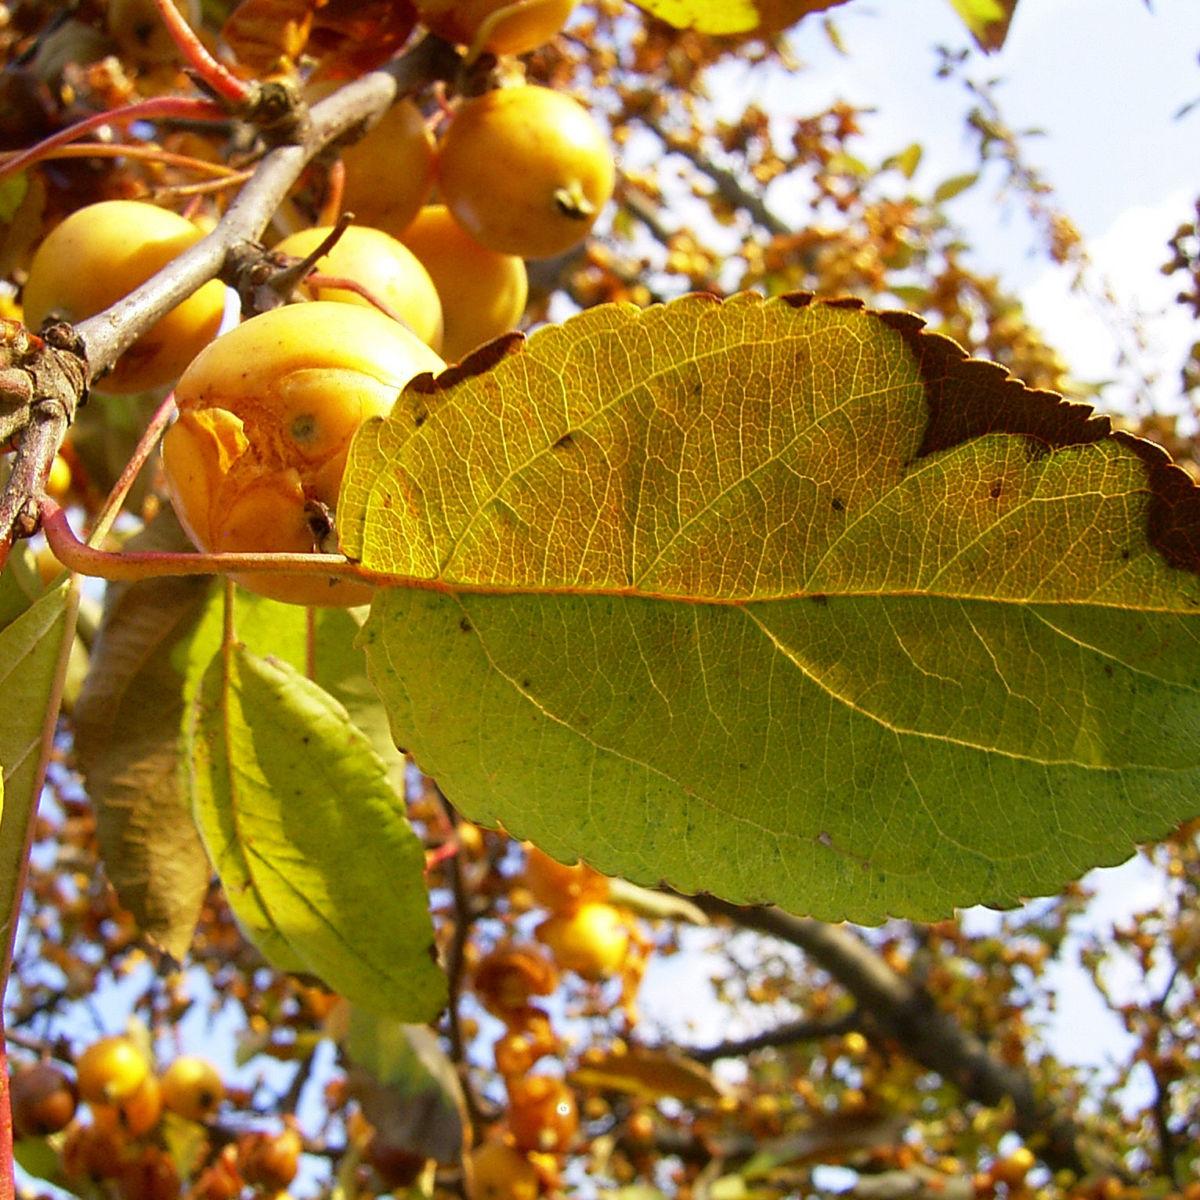 Holzapfel gelb orange Fruechte Malus Butterball